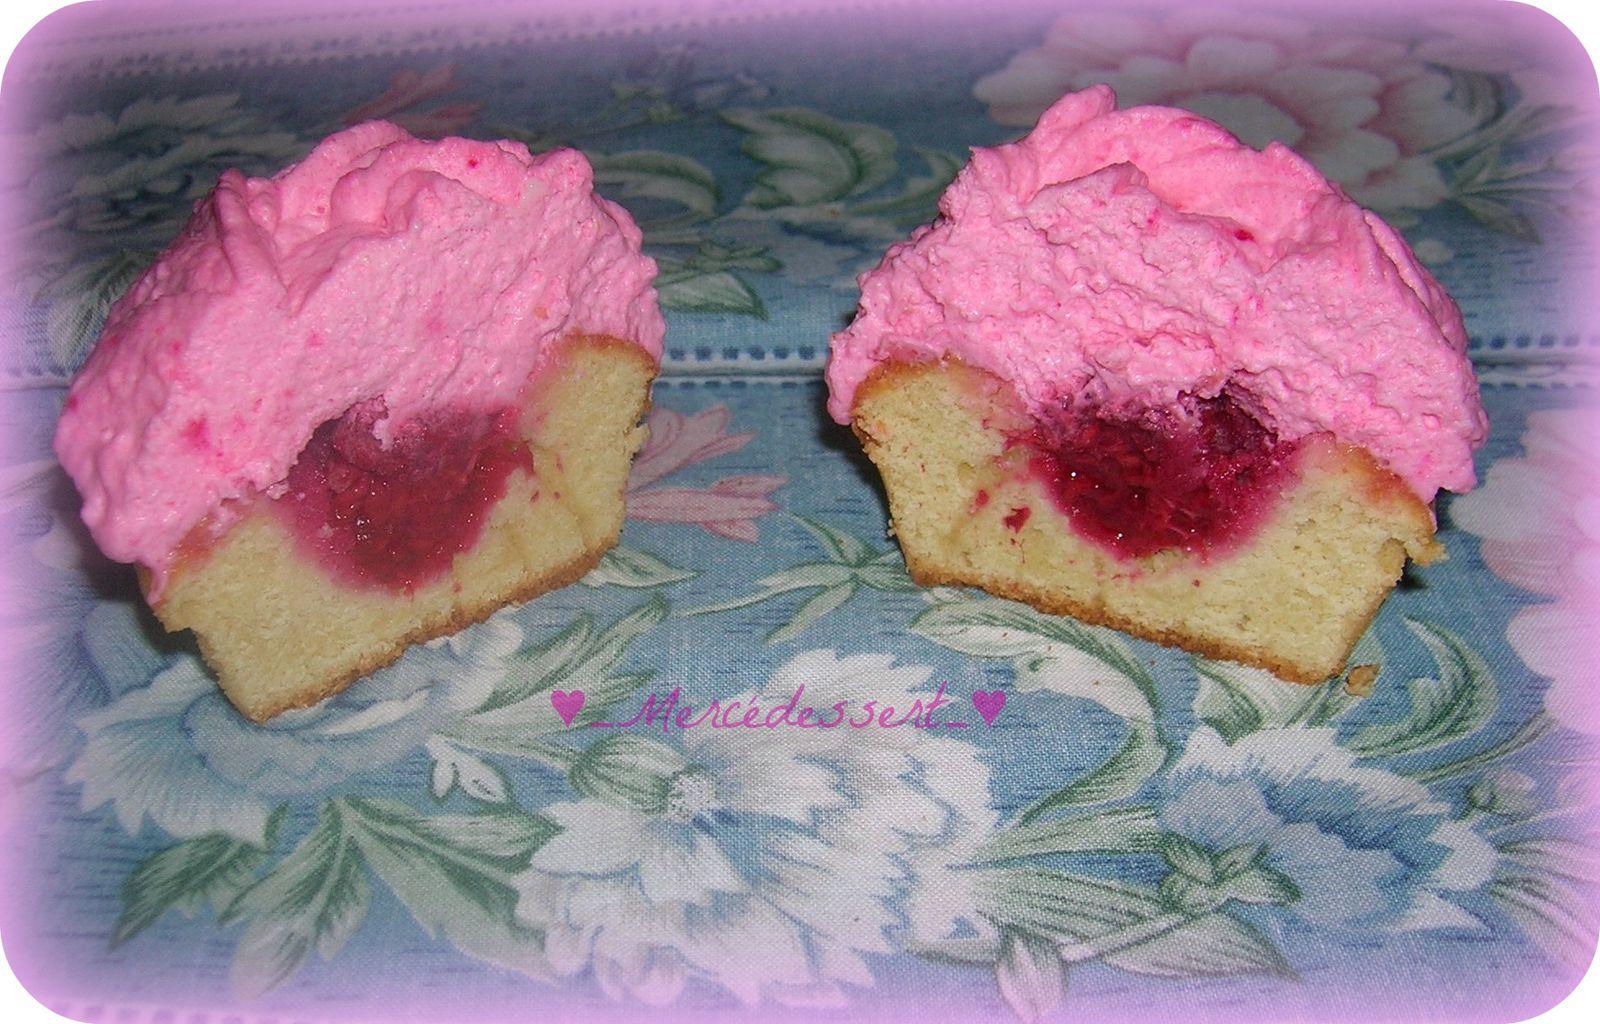 Cupcake vanille coeur framboise et nappage crème au mascarpone